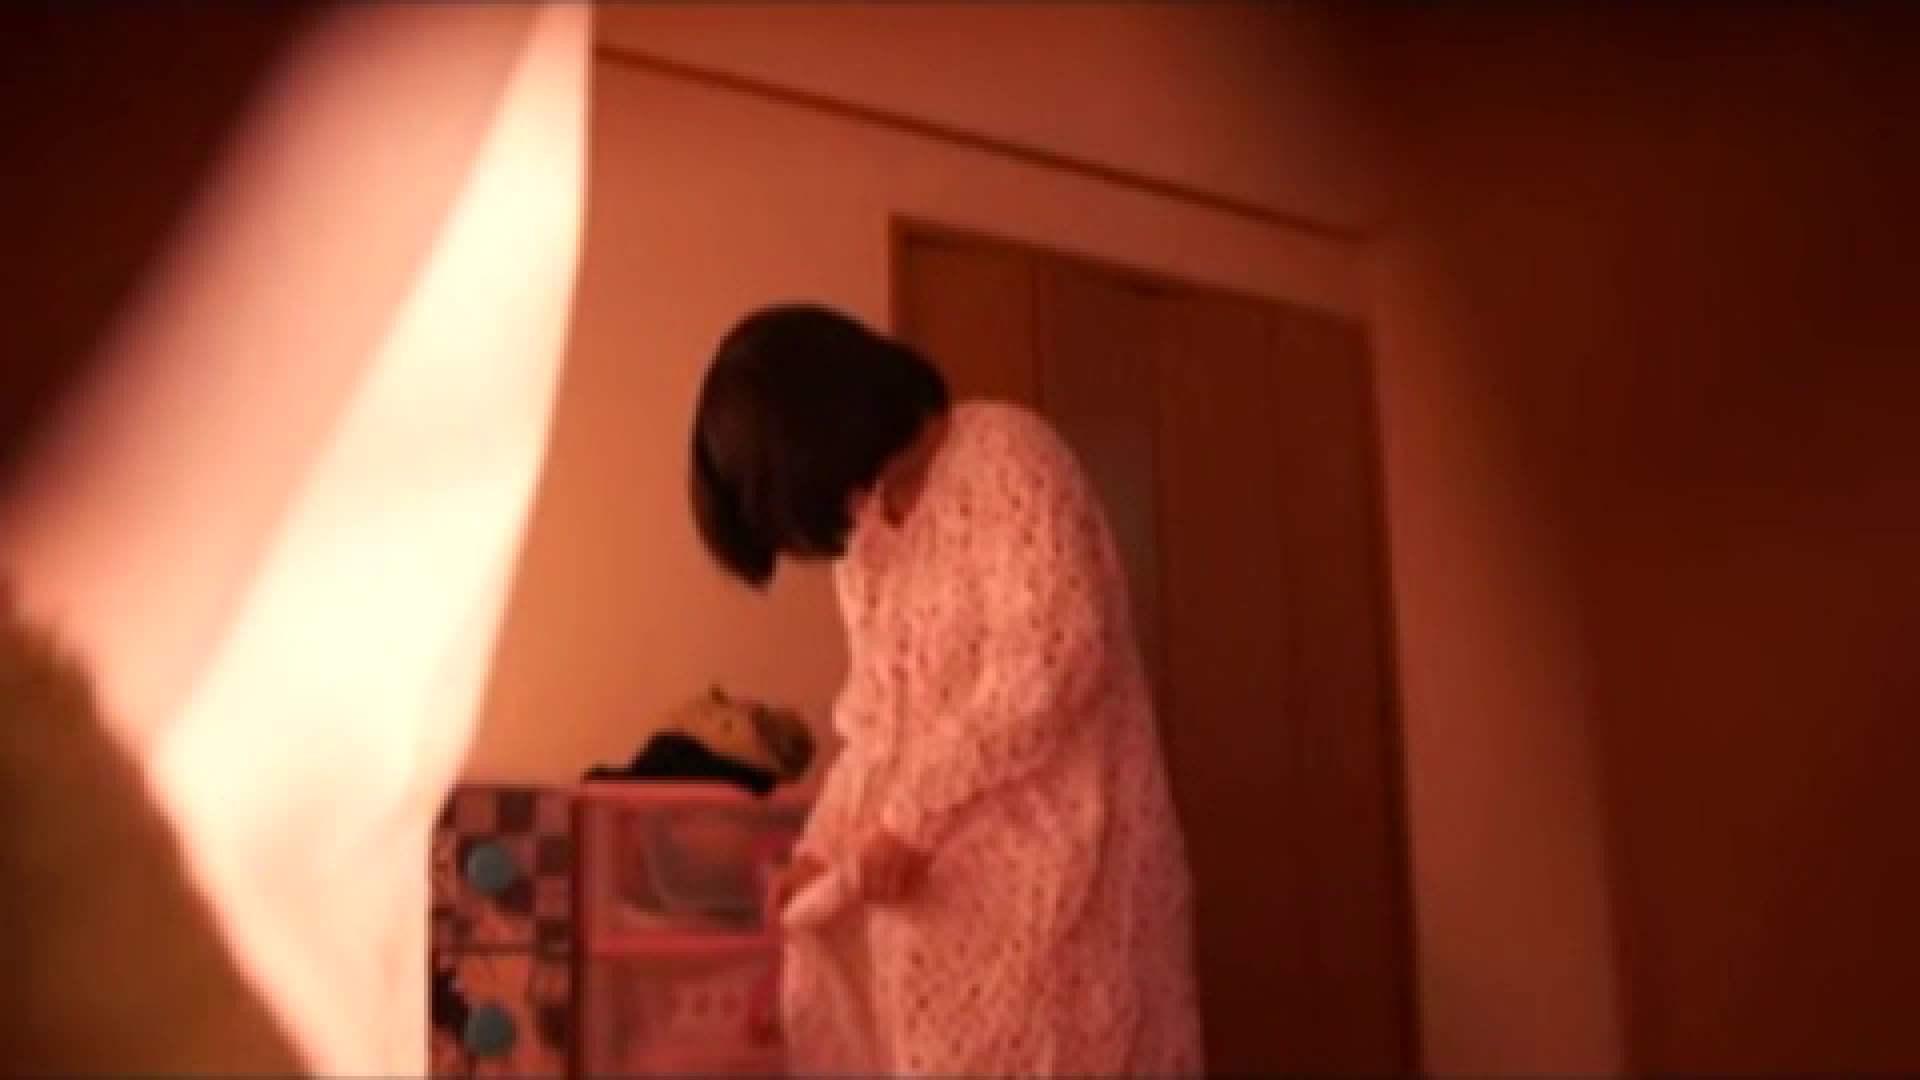 vol.2 まりこさんのお着替え、就寝前の映像です。 エッチすぎるOL達  29連発 4